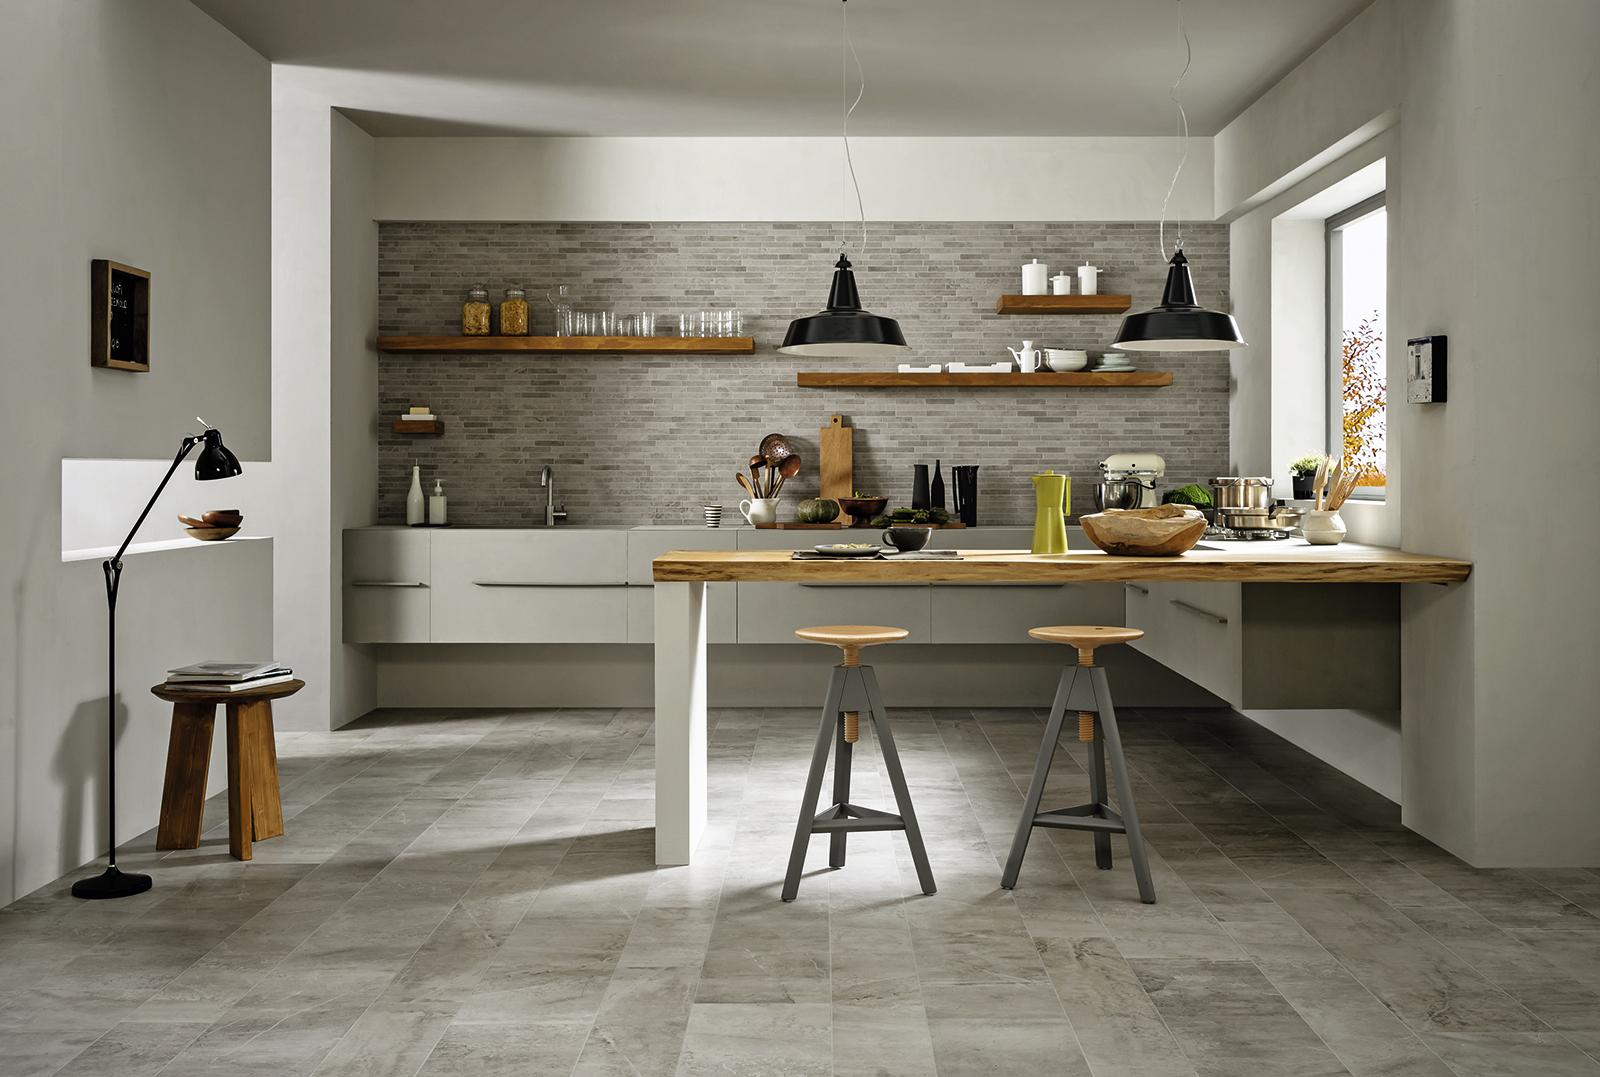 Marazzi Kitchens Covent Garden Rivestimento Bagno E Cucina Marazzi ...